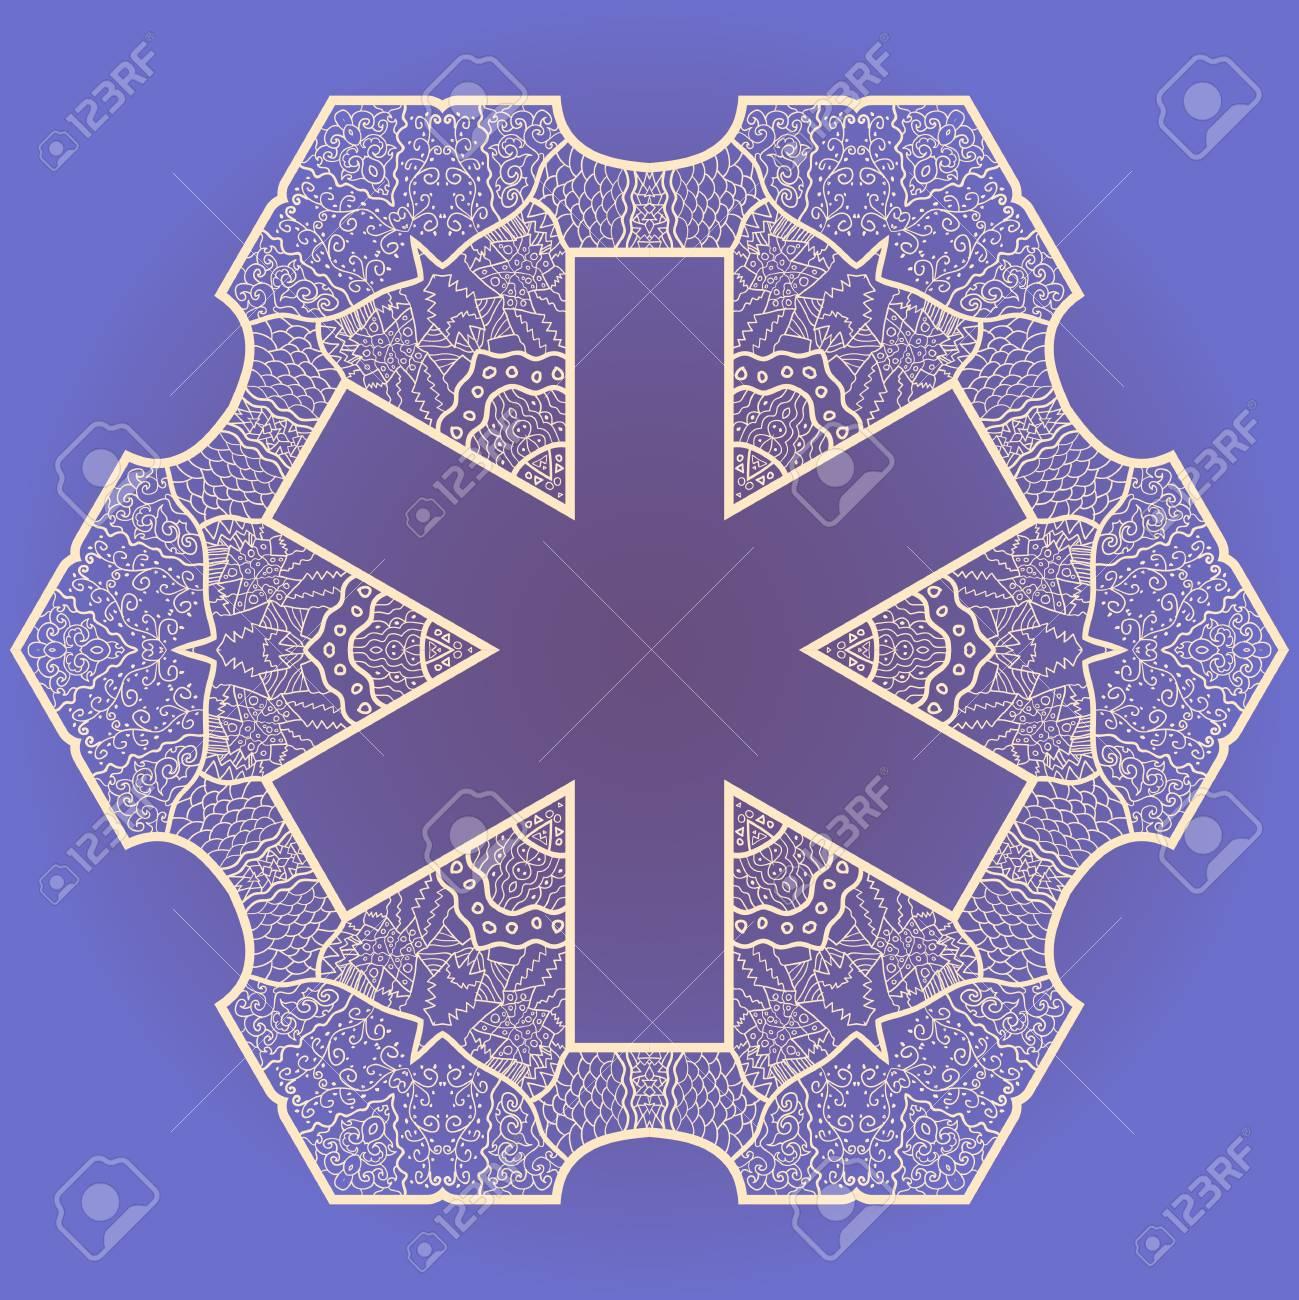 Oriental mandala motif round lase pattern on the violet background, like snowflake or mehndi paint Stock Vector - 18115749